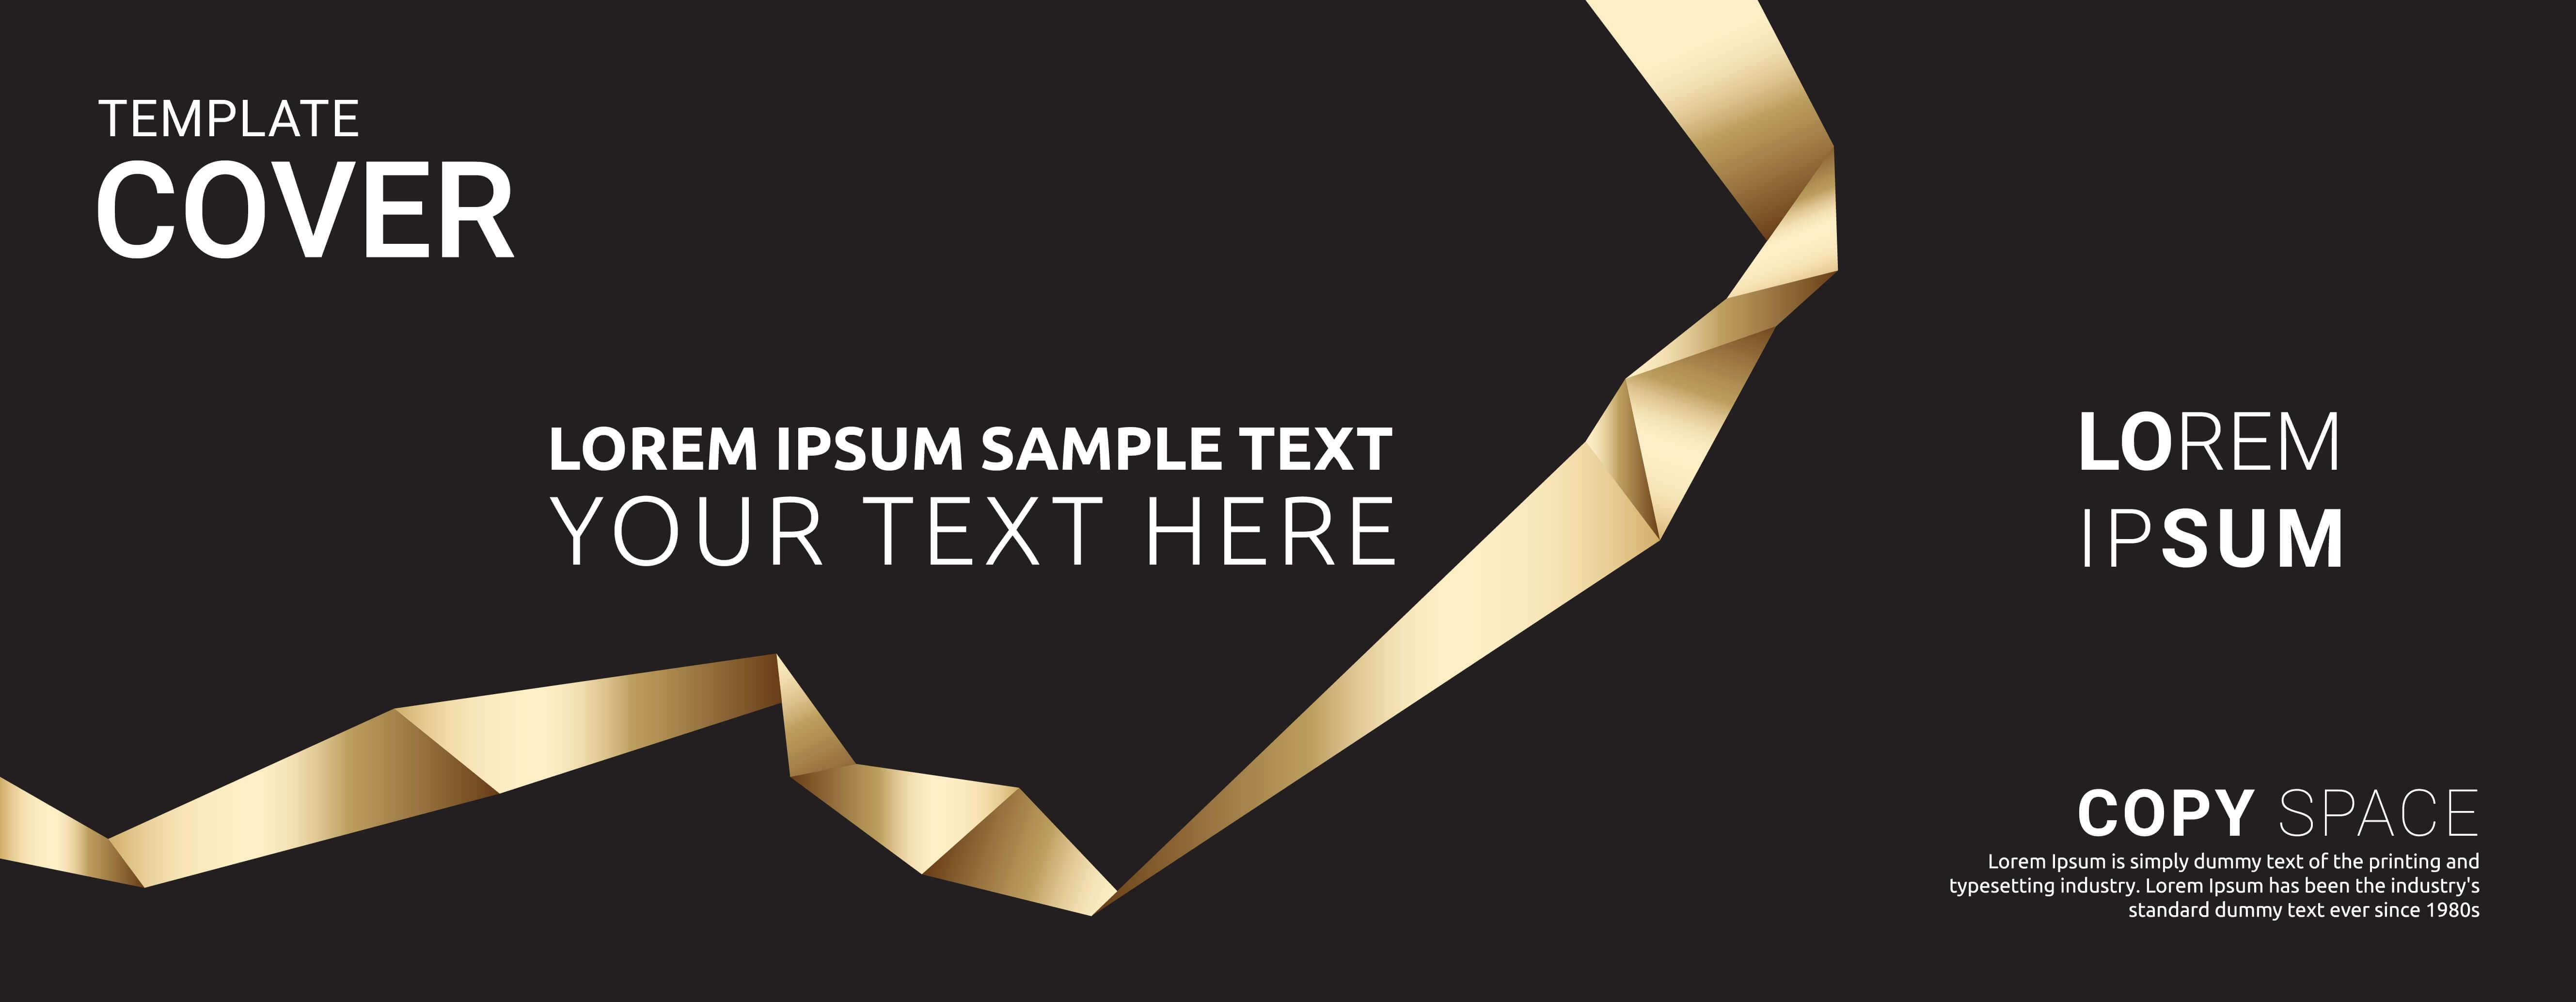 Cover Design Template. Leaflet Advertising, Vinyl Banner With Vinyl Banner Design Templates